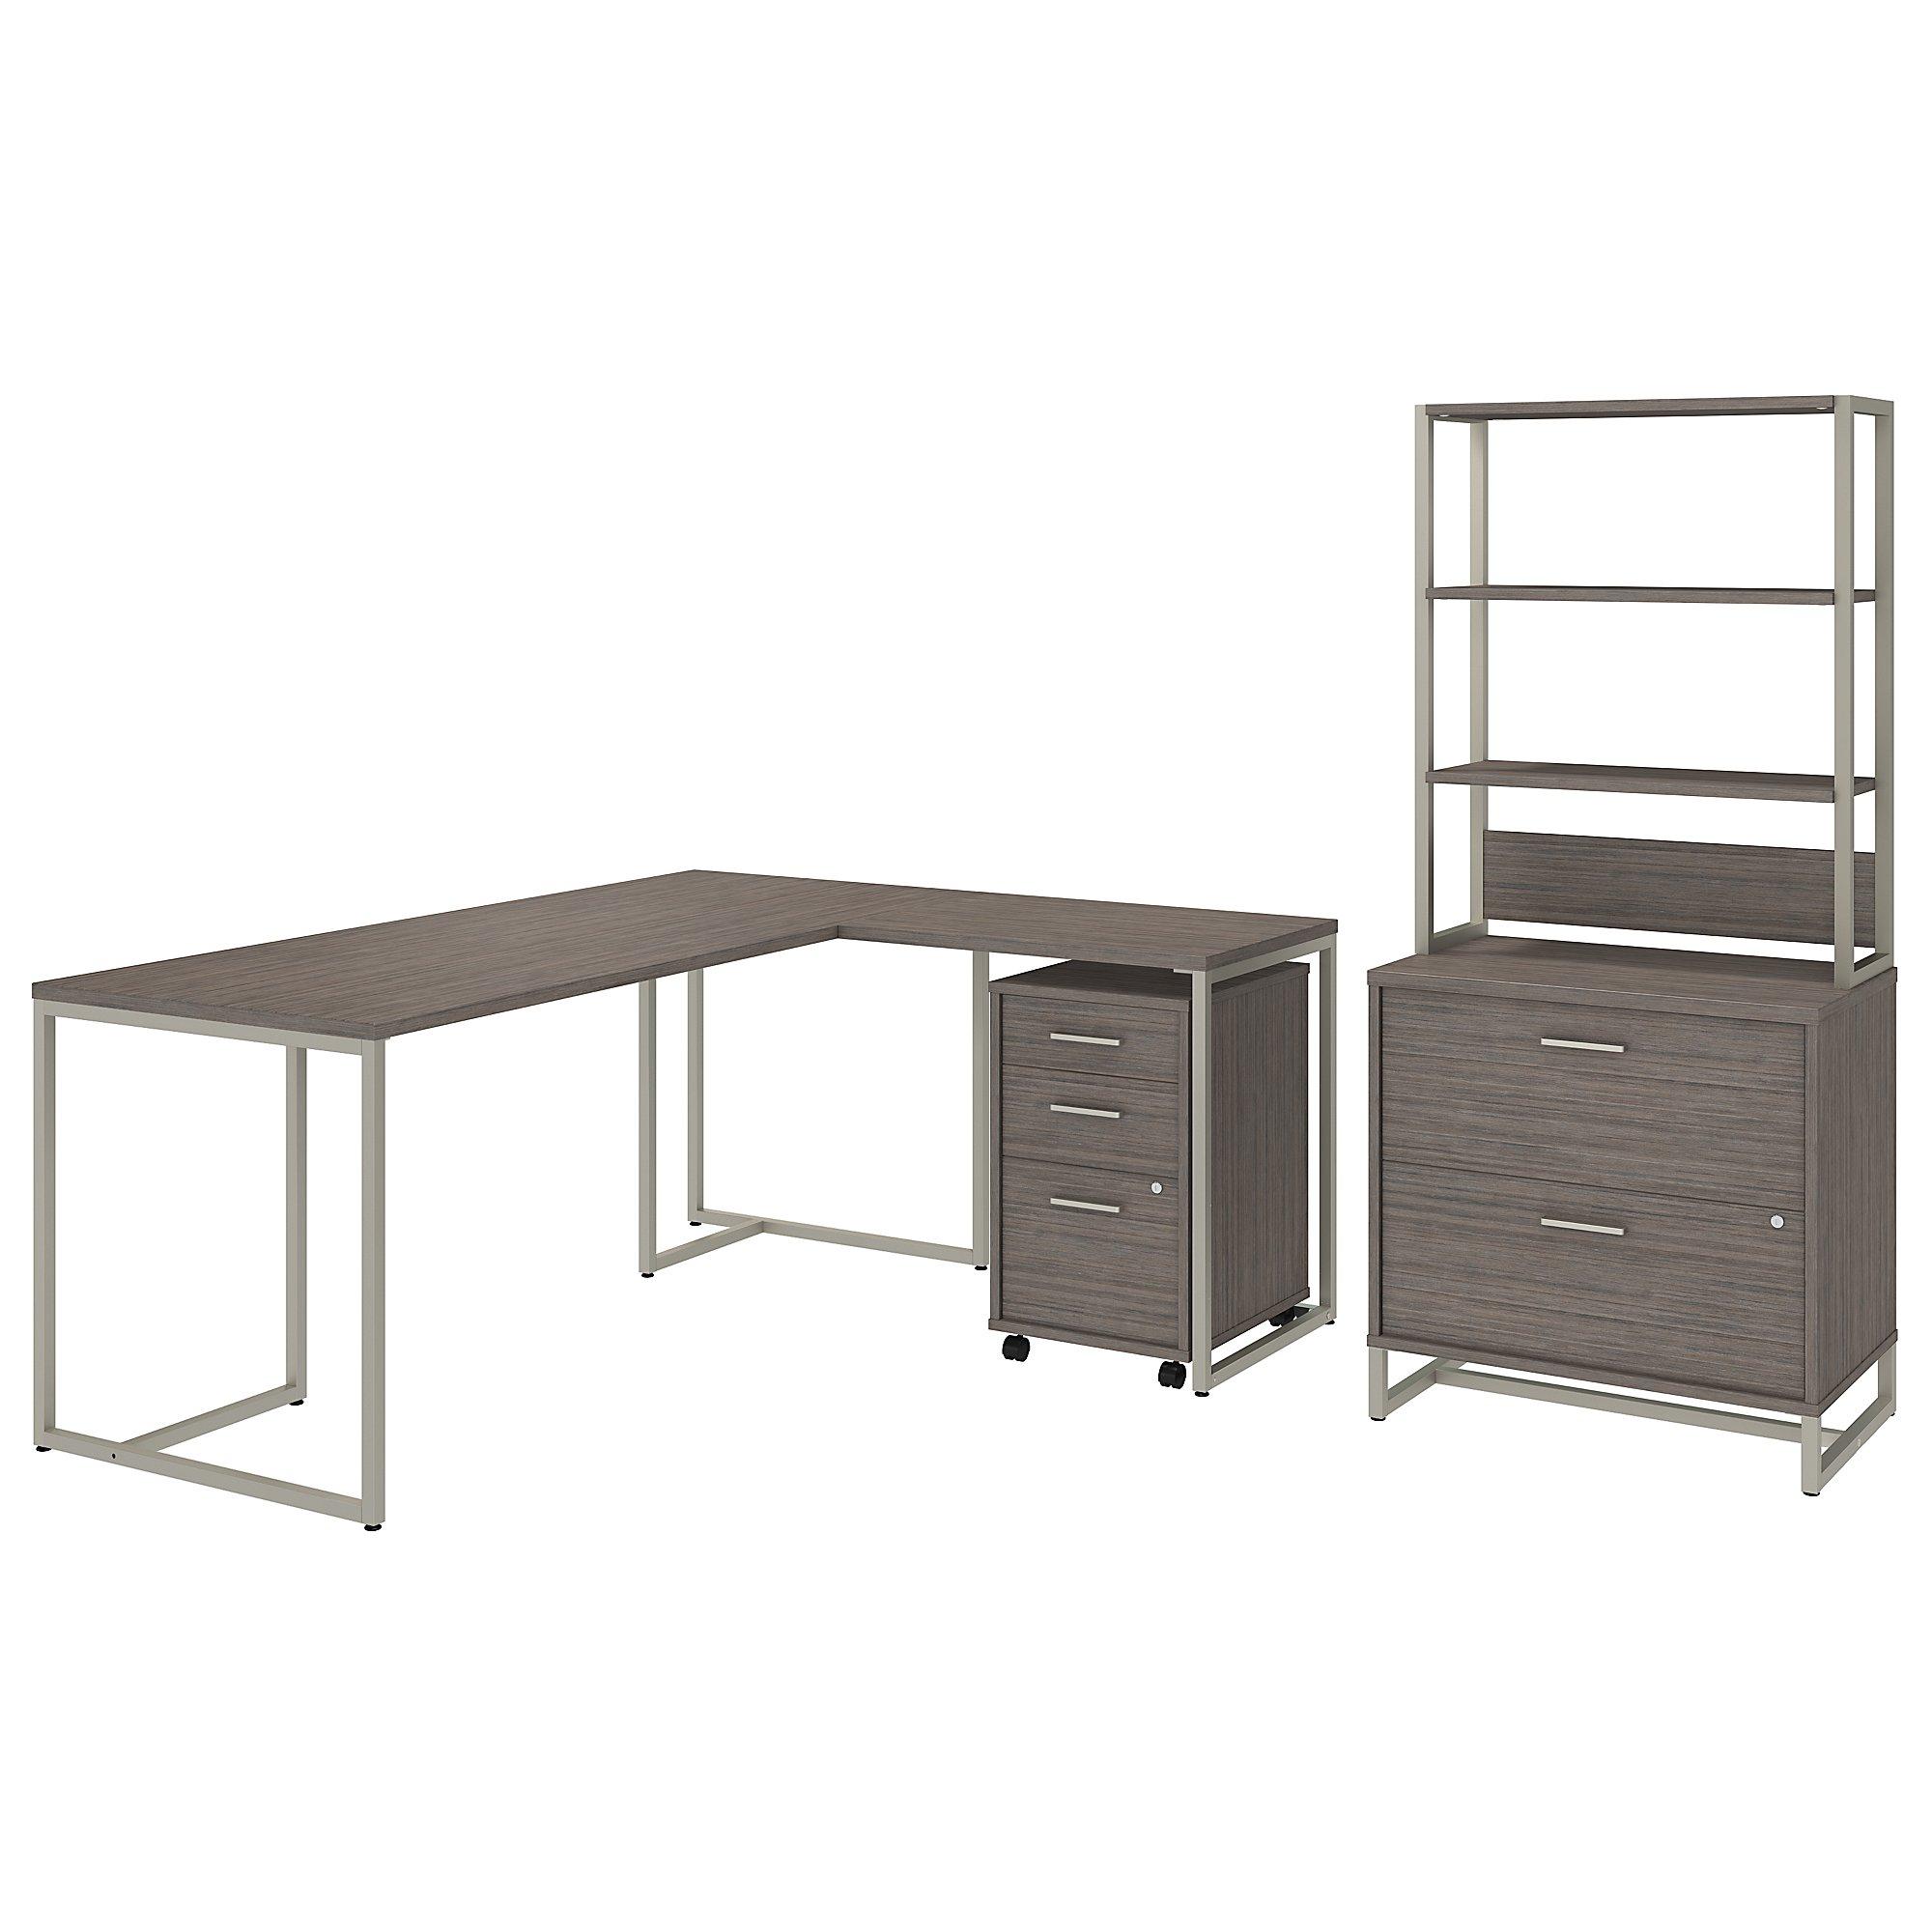 kathy ireland method executive furniture set in cocoa